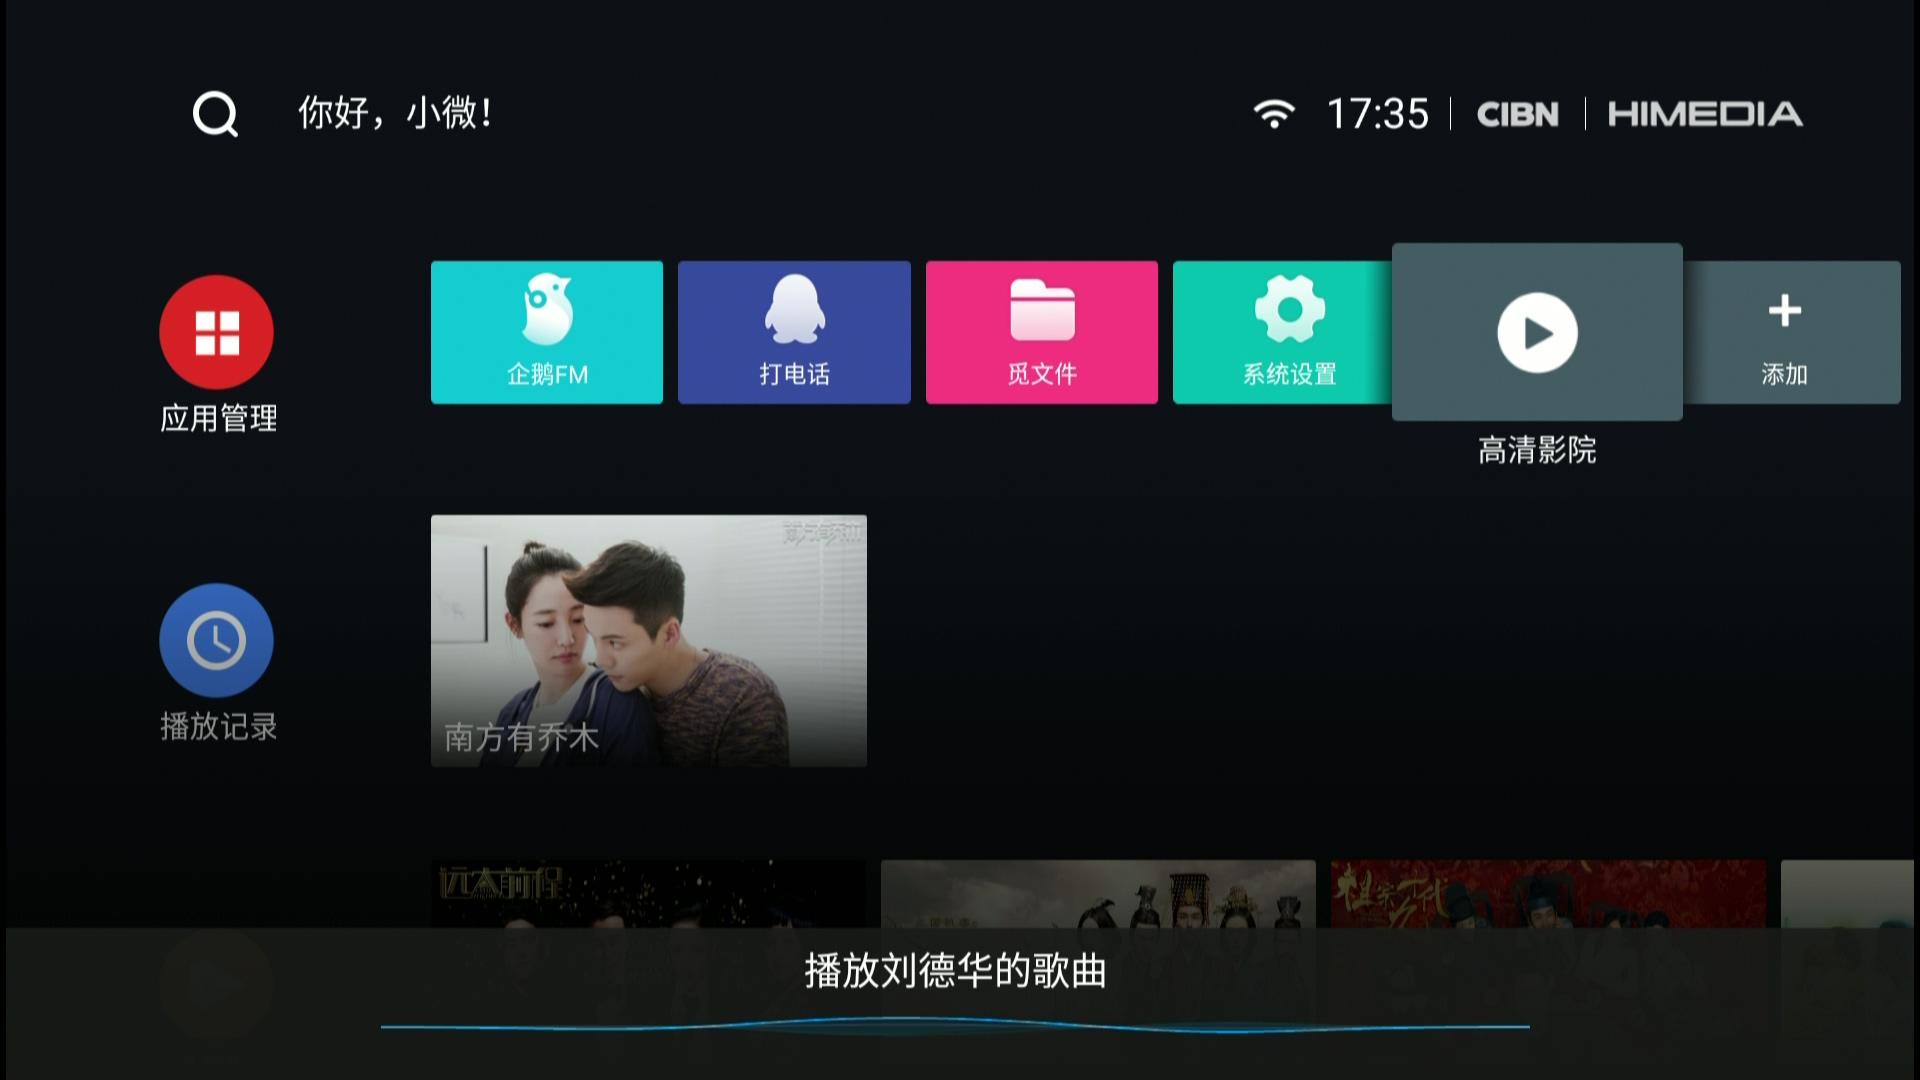 TV_CAM_设备_20180408_173551.094.jpg